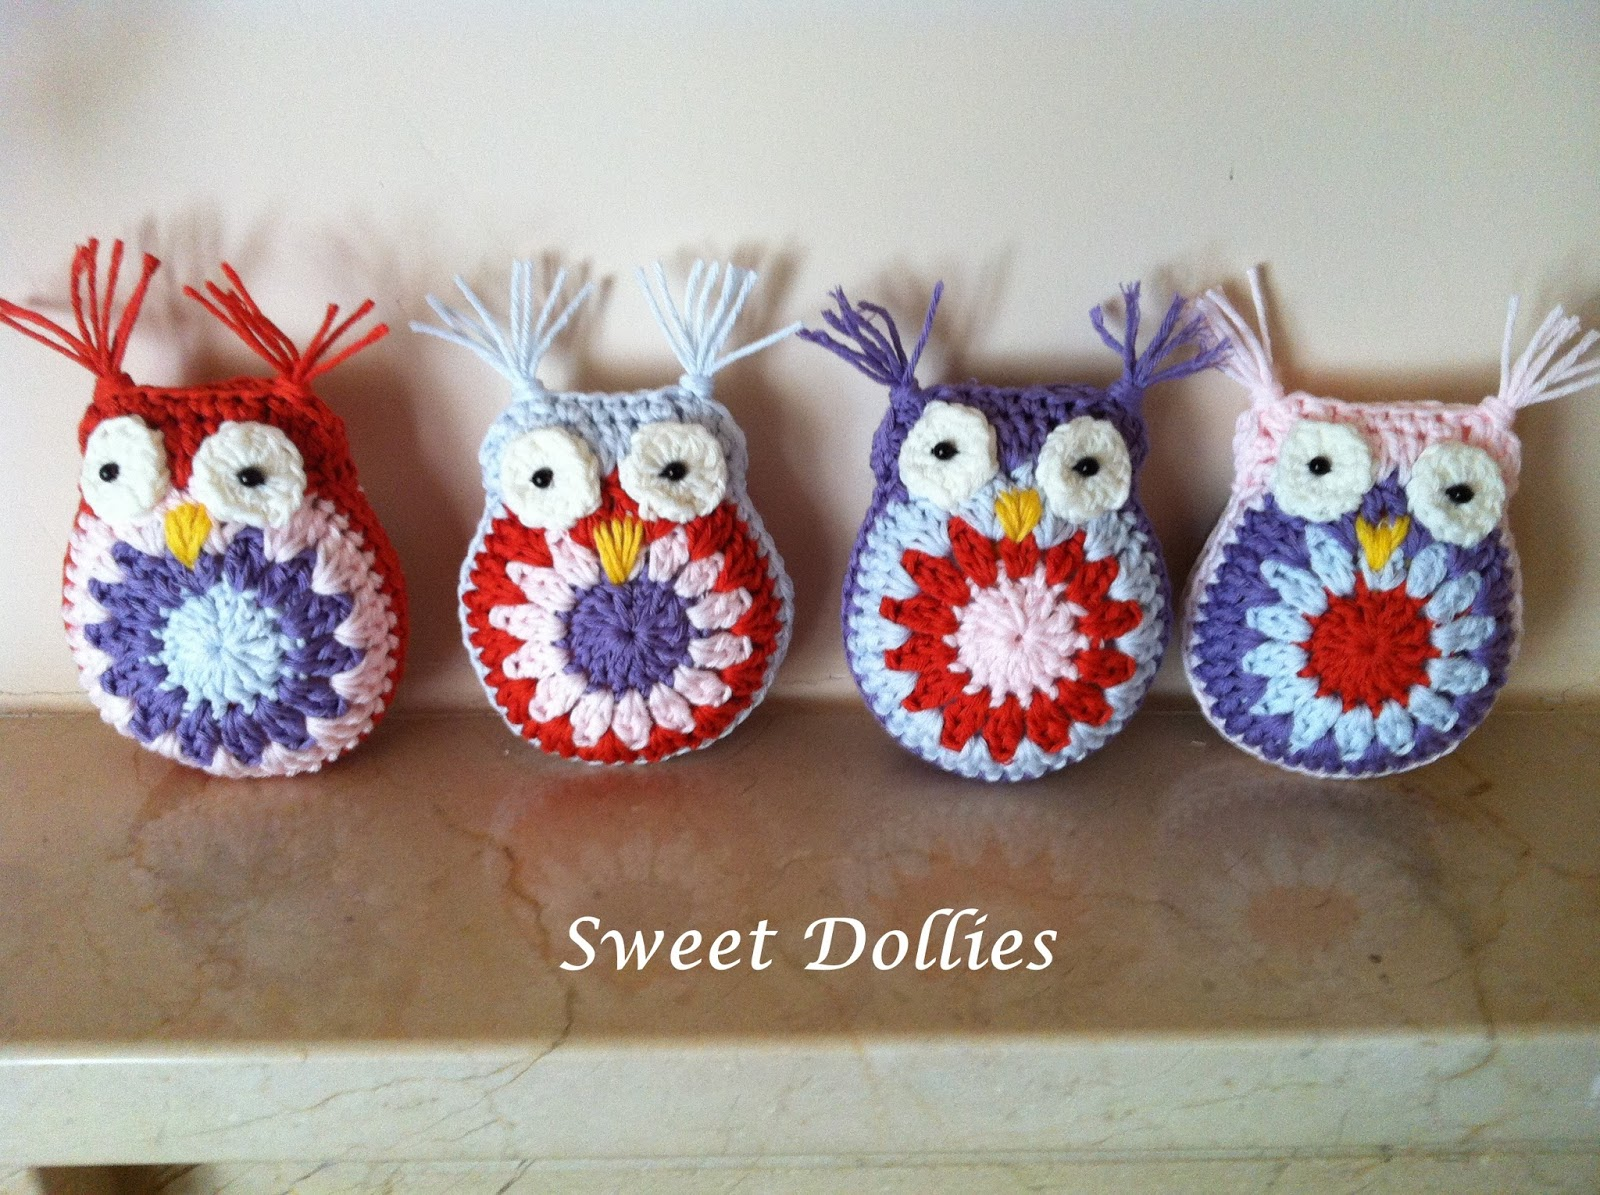 Sweet Dollies